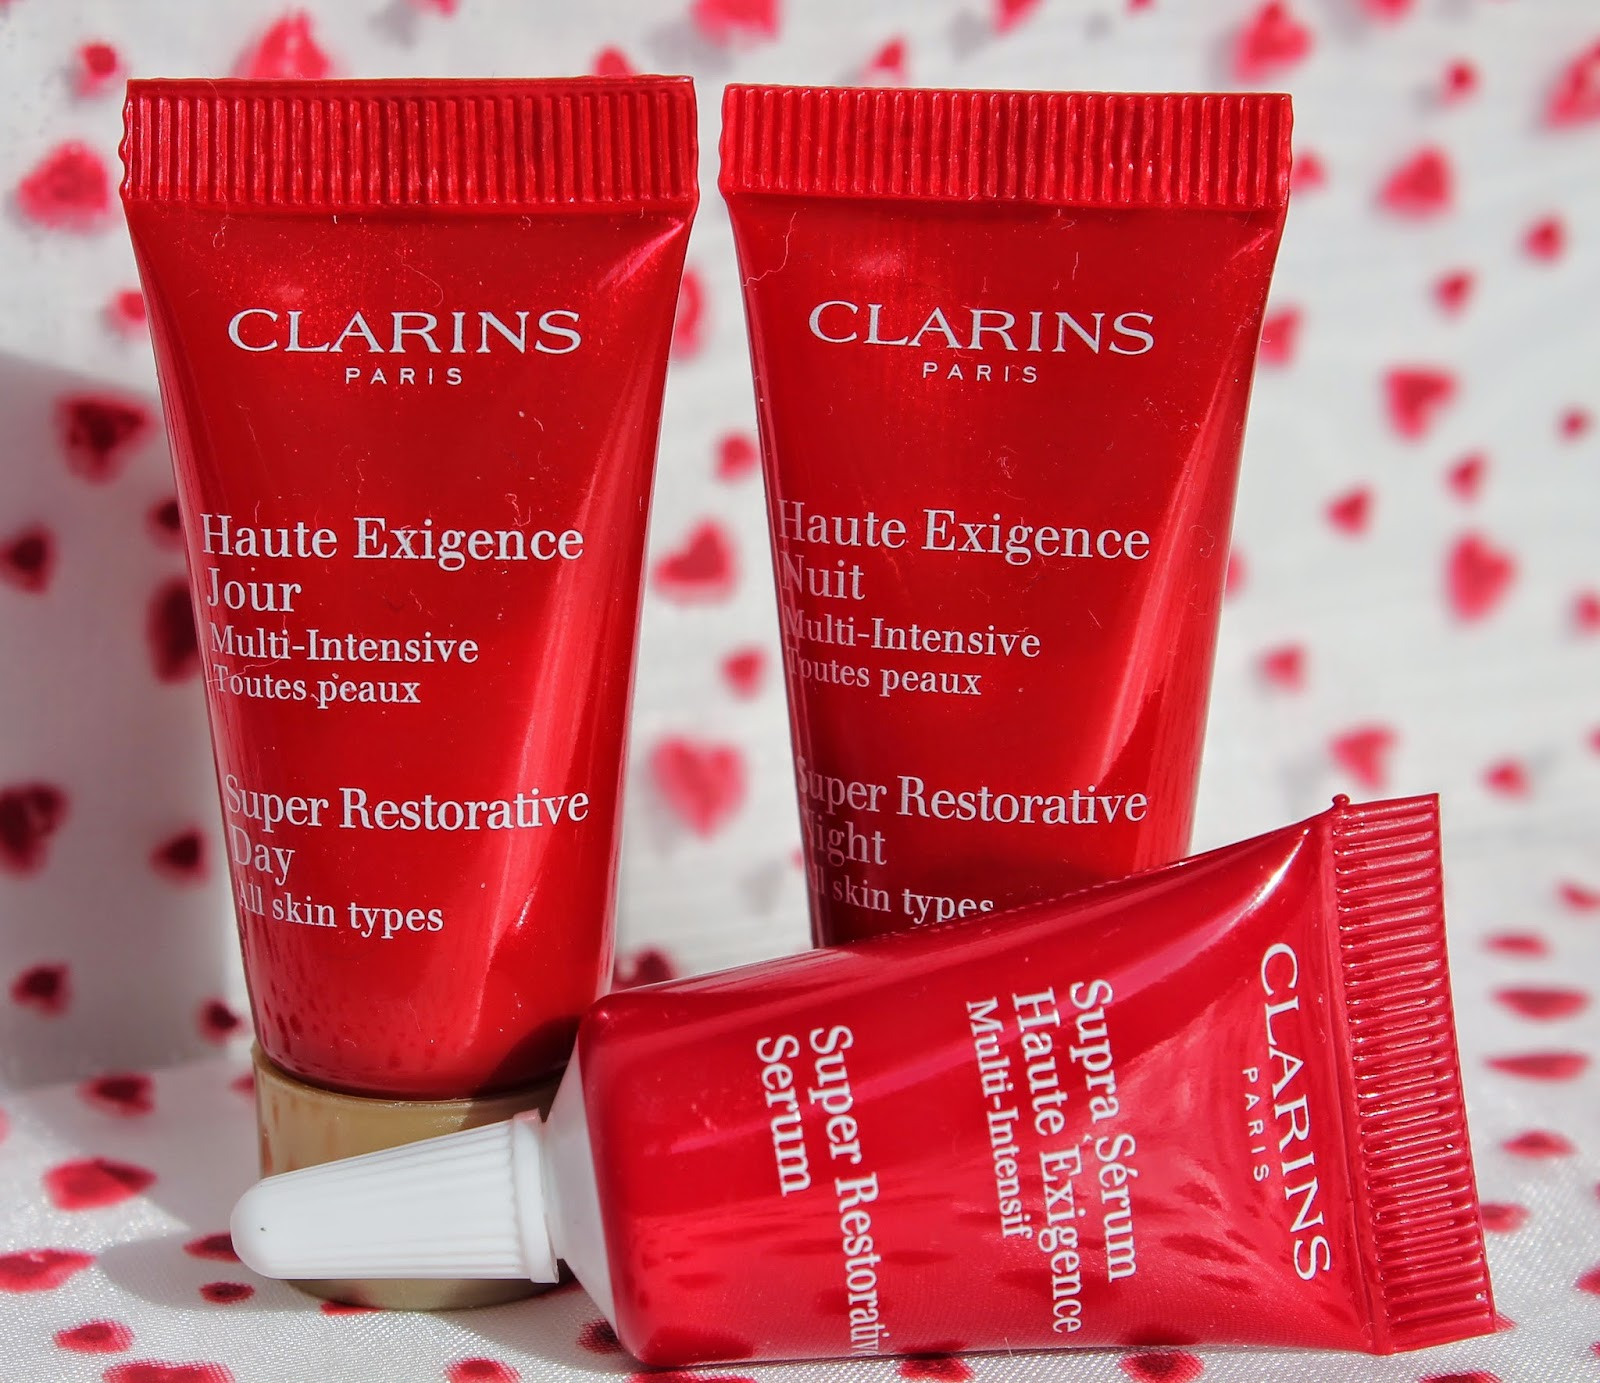 Haute Exigence Clarins